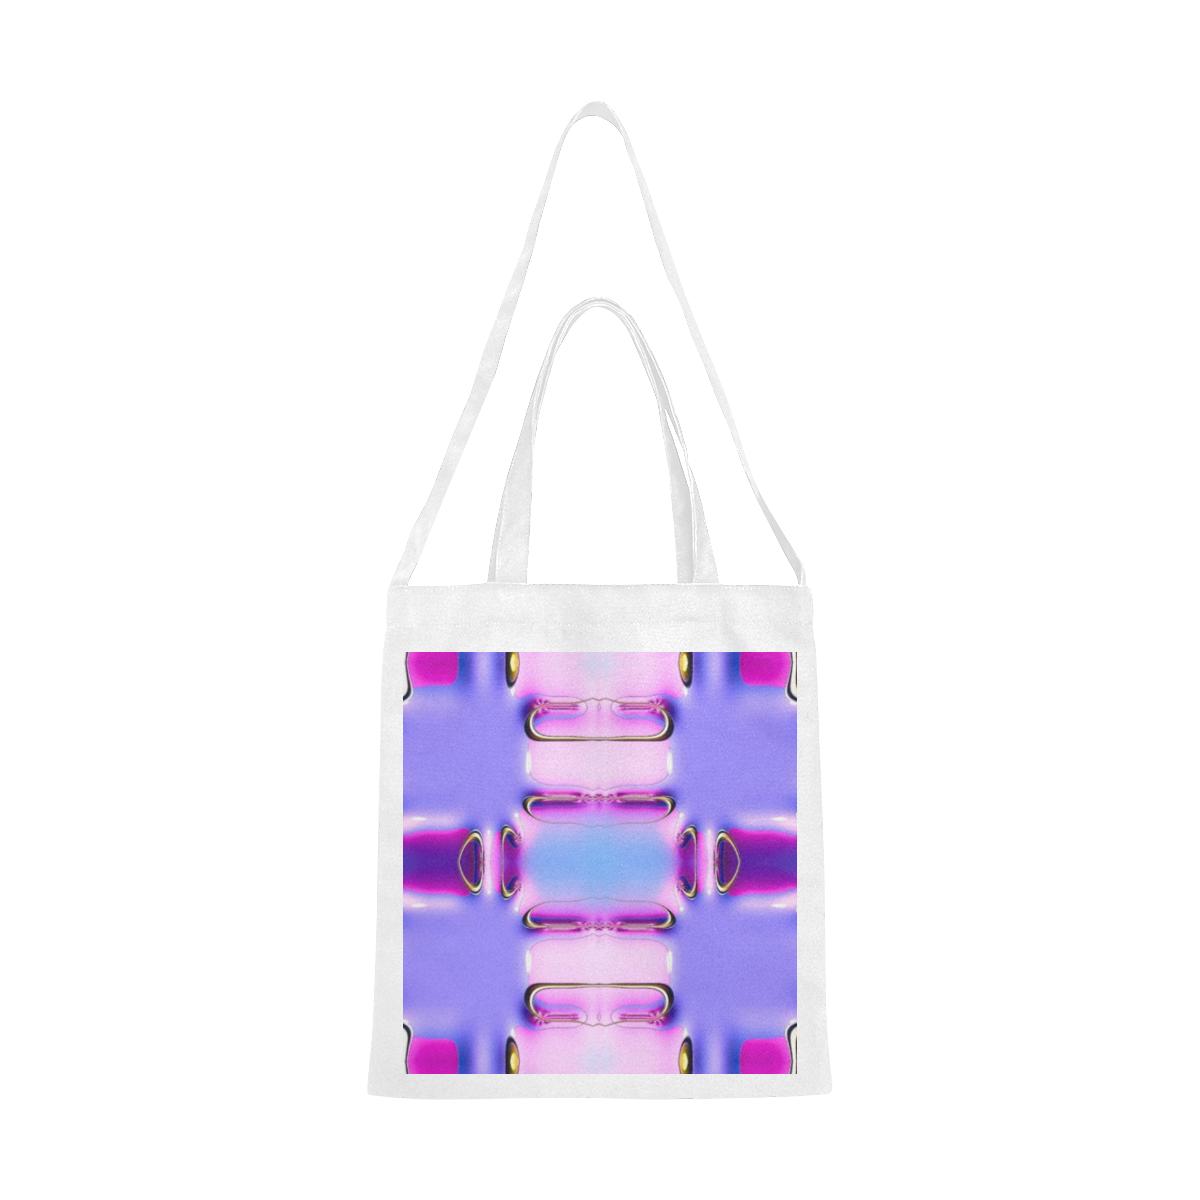 toote bag-arp-6554 Canvas Tote Bag/Medium (Model 1701)